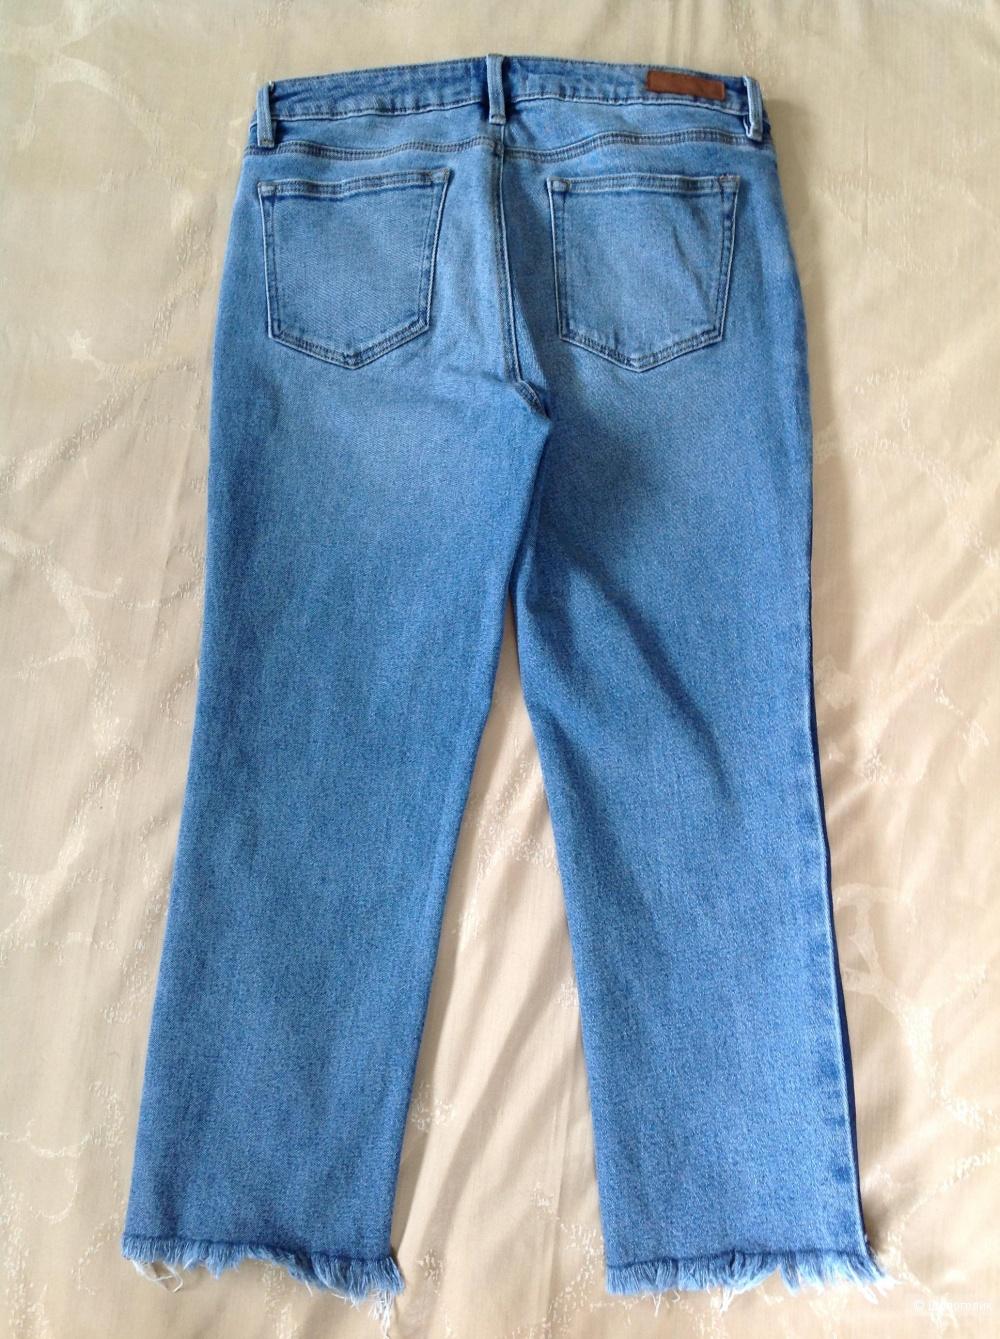 Джинсы Tom Tailor, размер 31, на 46-48-50